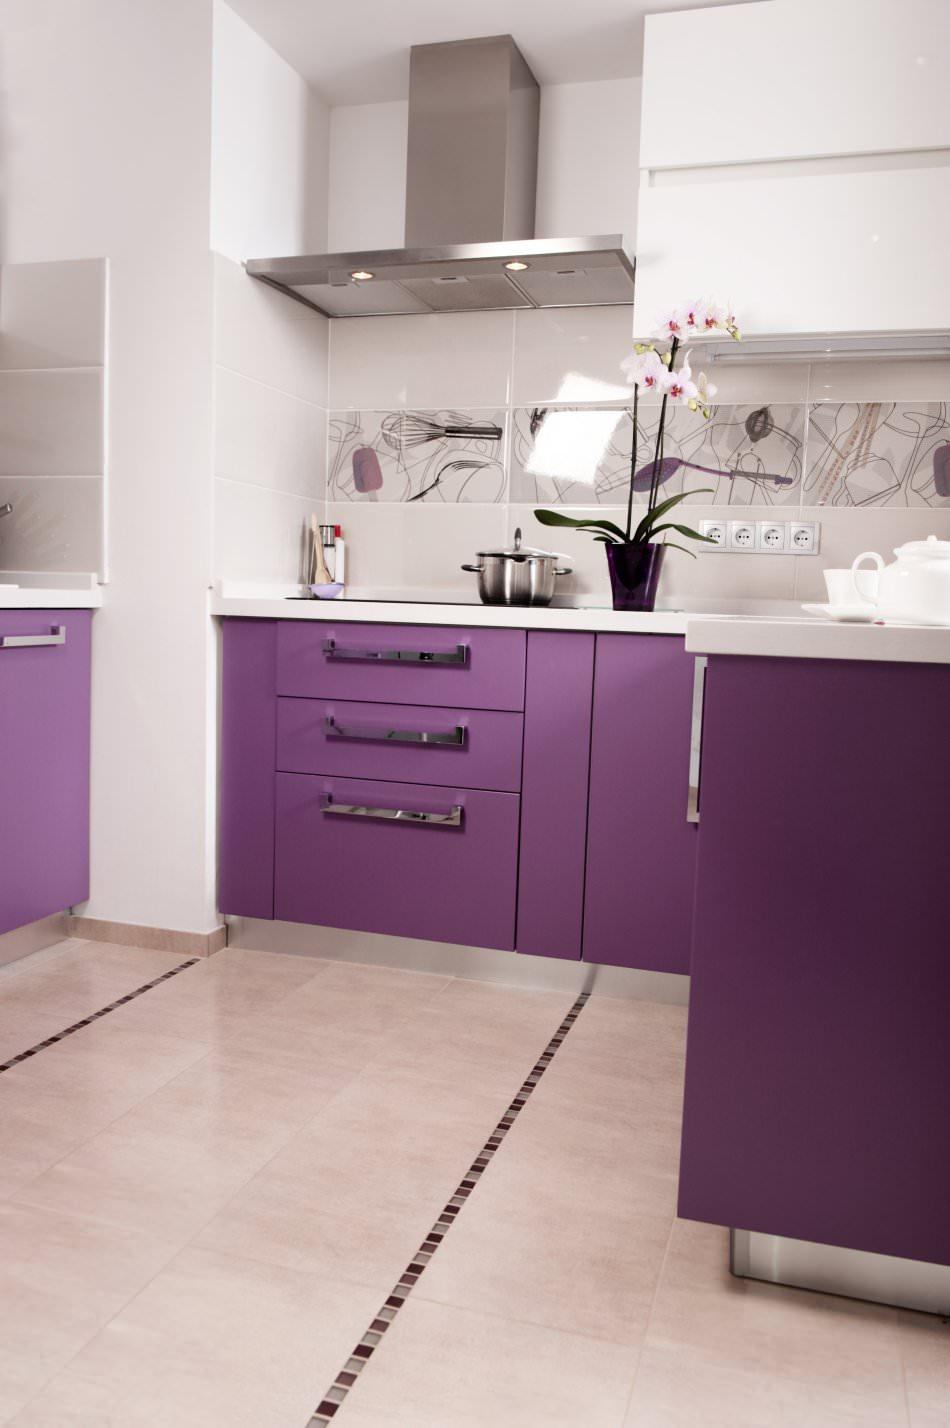 RAL 4008 Signal Violet Matte Kitchen Cabinets